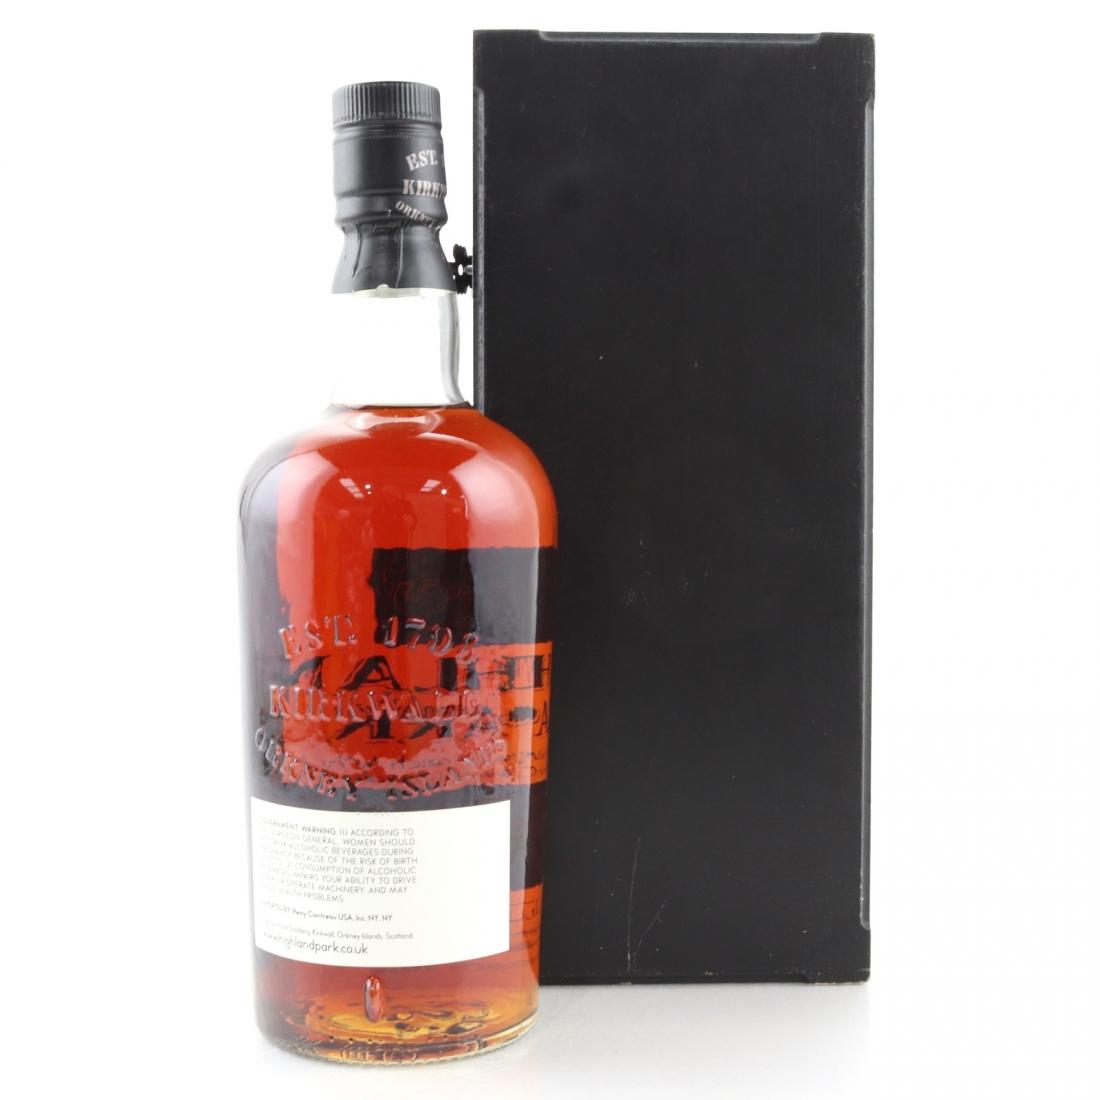 Highland Park 1982 Single Cask 23 Year Old #443 75cl / Whisky Magazine & Park Avenue Liquor Shop